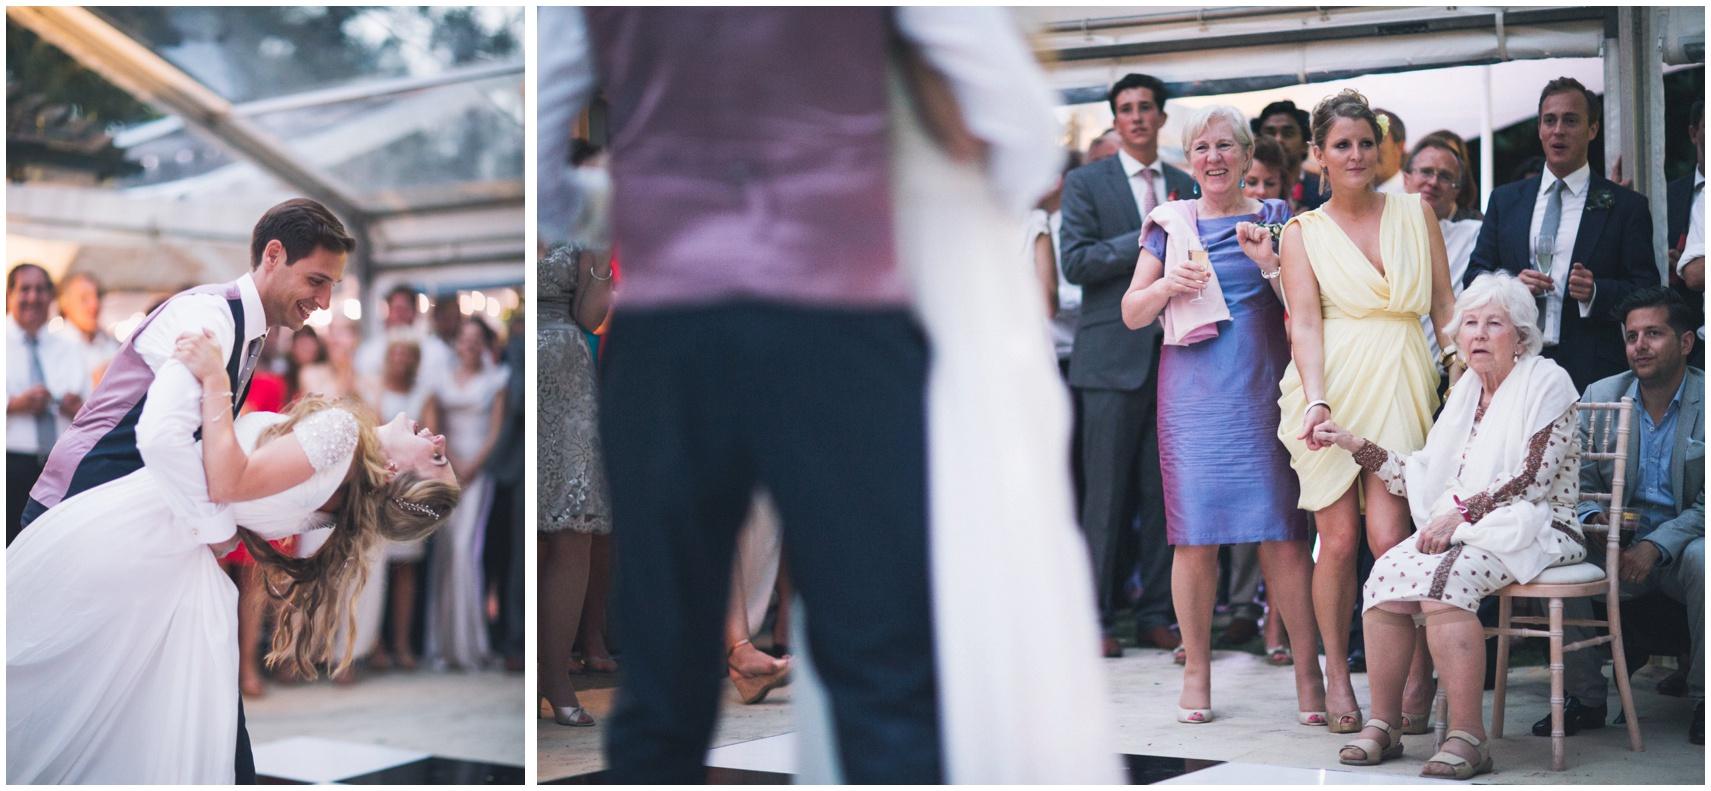 BMC Wedding photography Rutland_0357.jpg